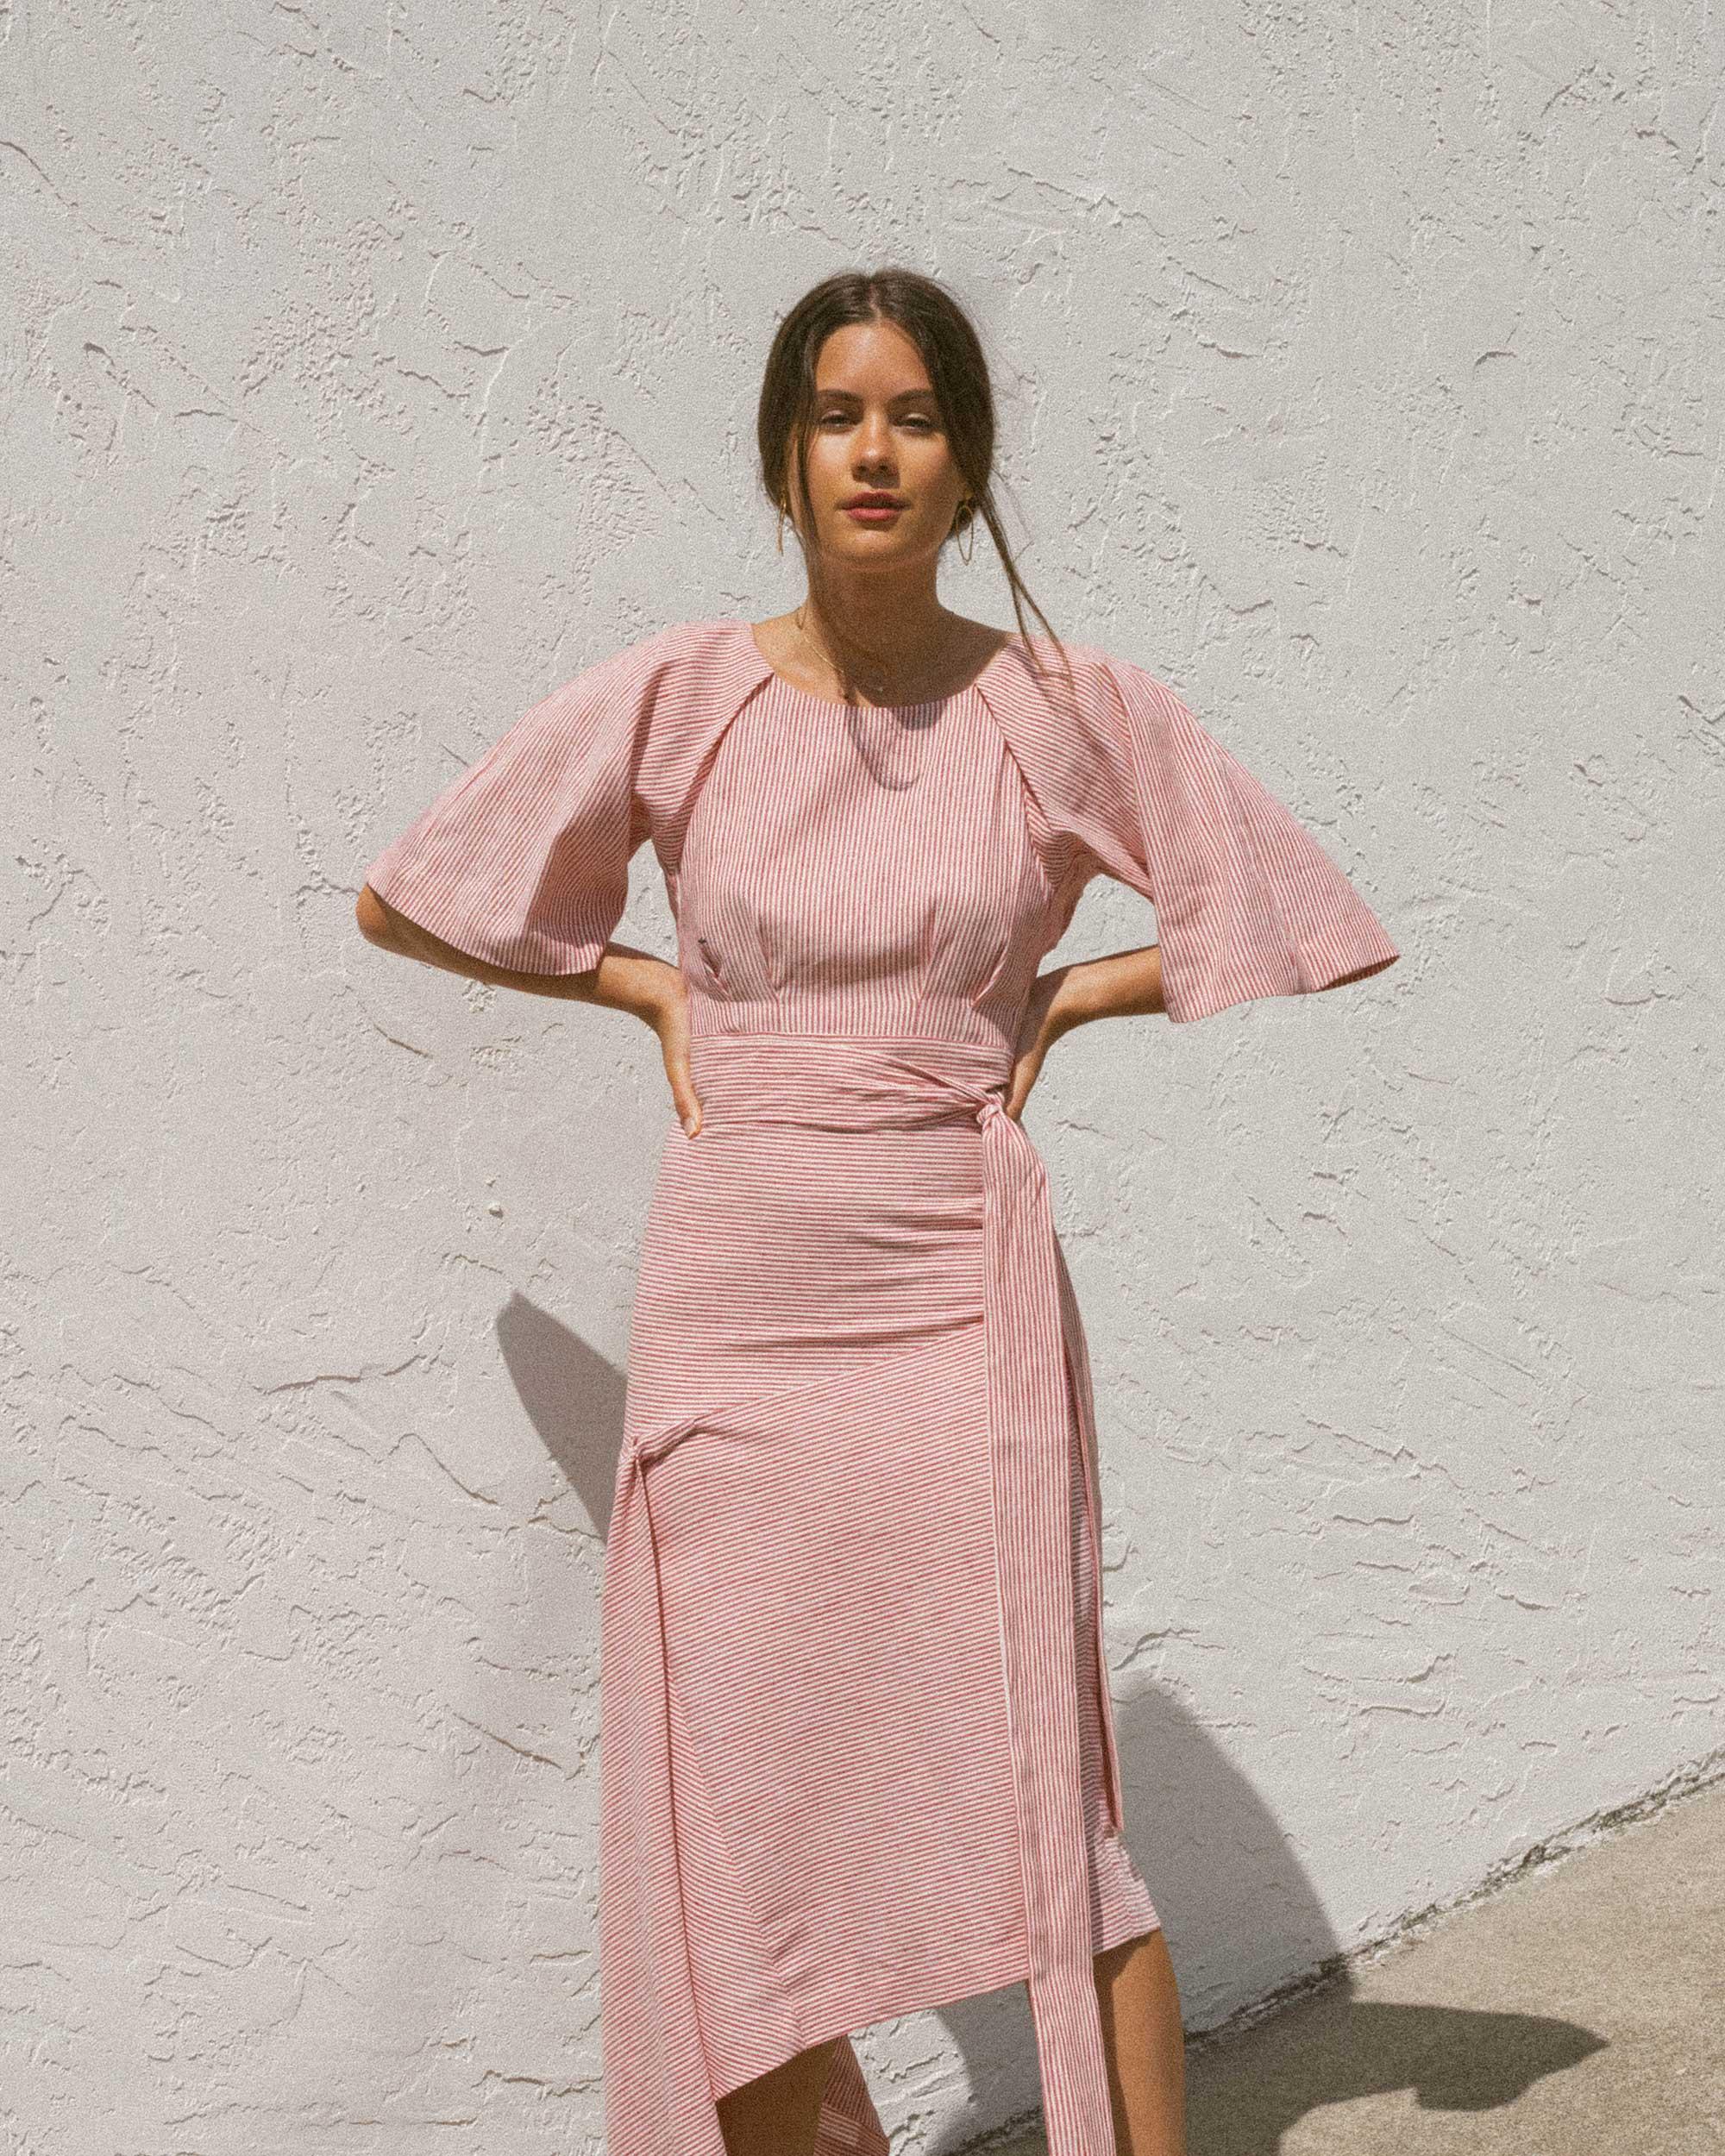 Sarah Butler of Sarah Styles wears BcbgMaxAzria Pinstripe Asymmetric Skirt and Pinstripe Cutout Back Cropped Top in Seattle   @sarahchristine -5.jpg